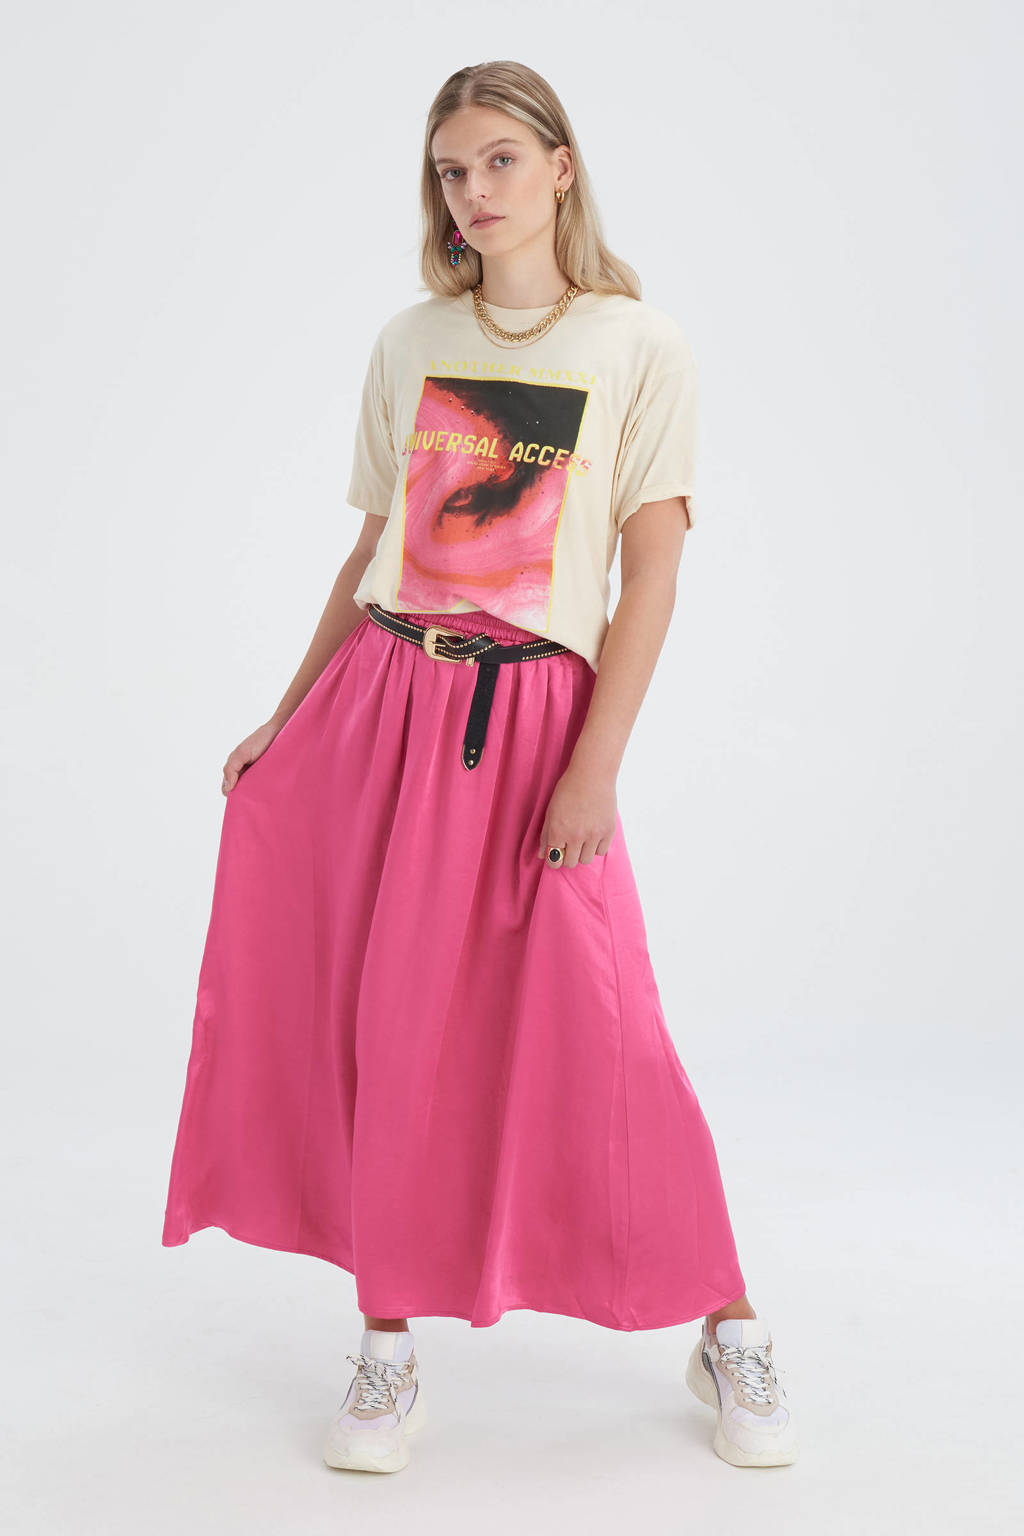 Eksept by Shoeby T-shirt Bowie Artwork met printopdruk zand, Zand